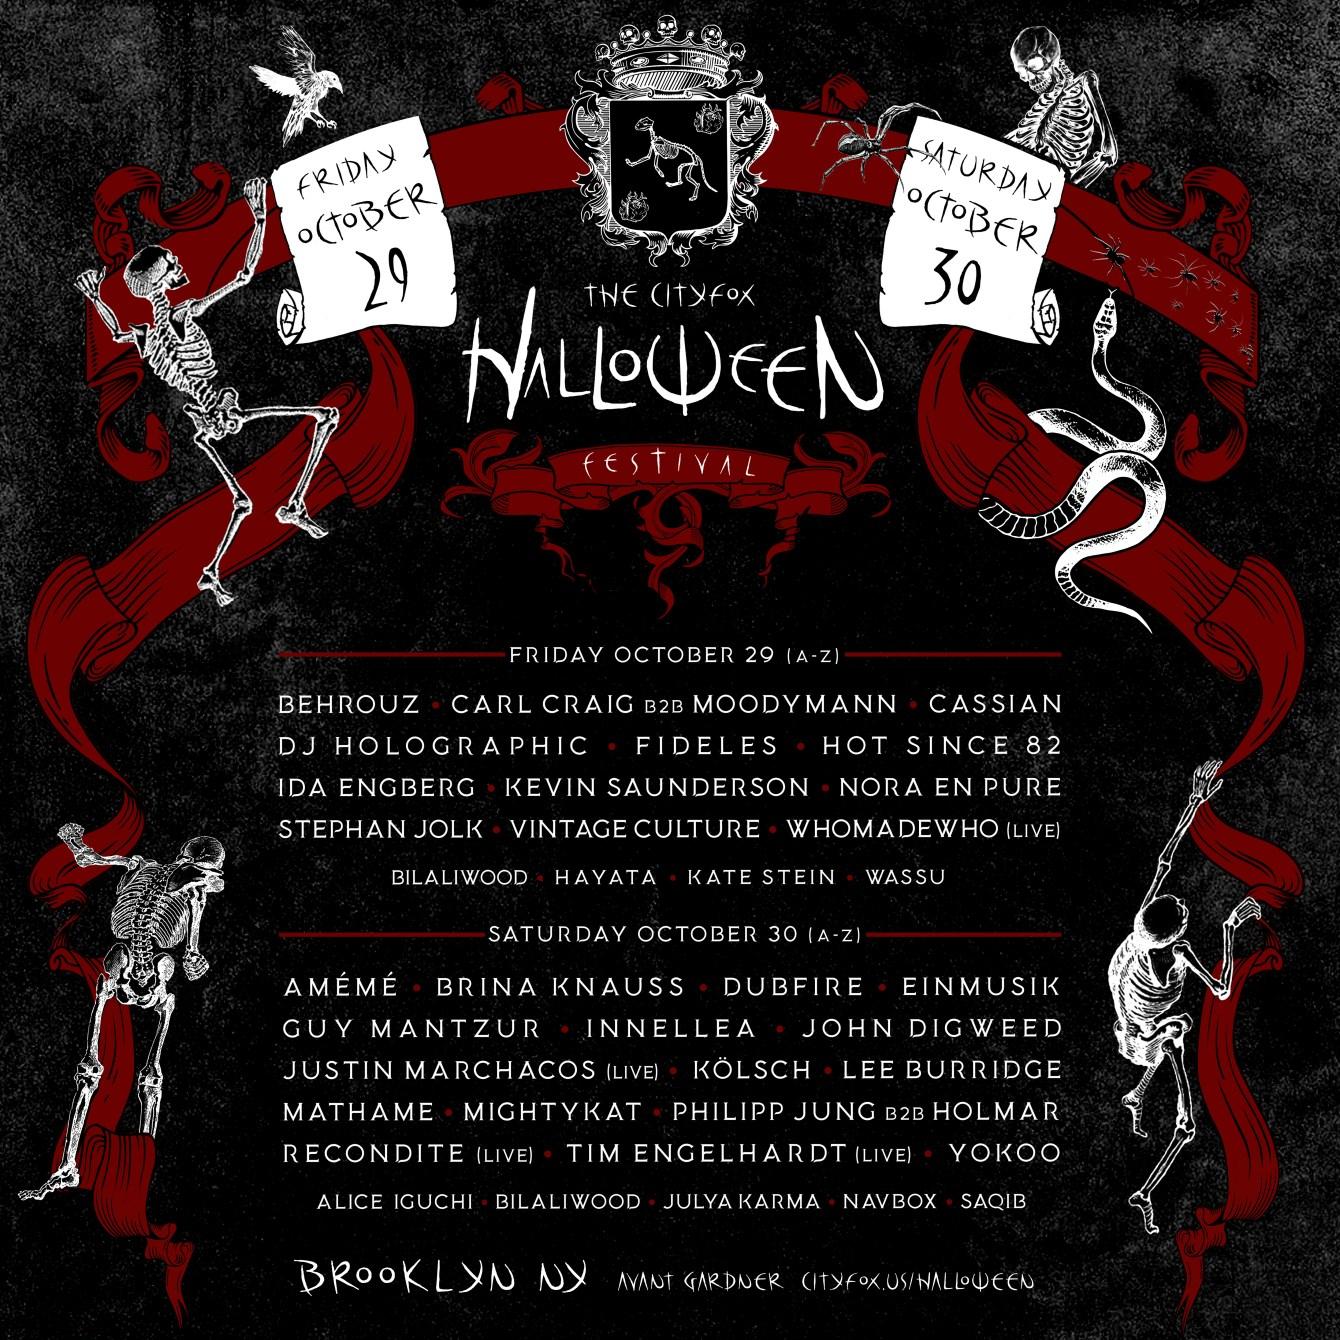 Cityfox Halloween Festival (OCT 29+30) - Flyer front